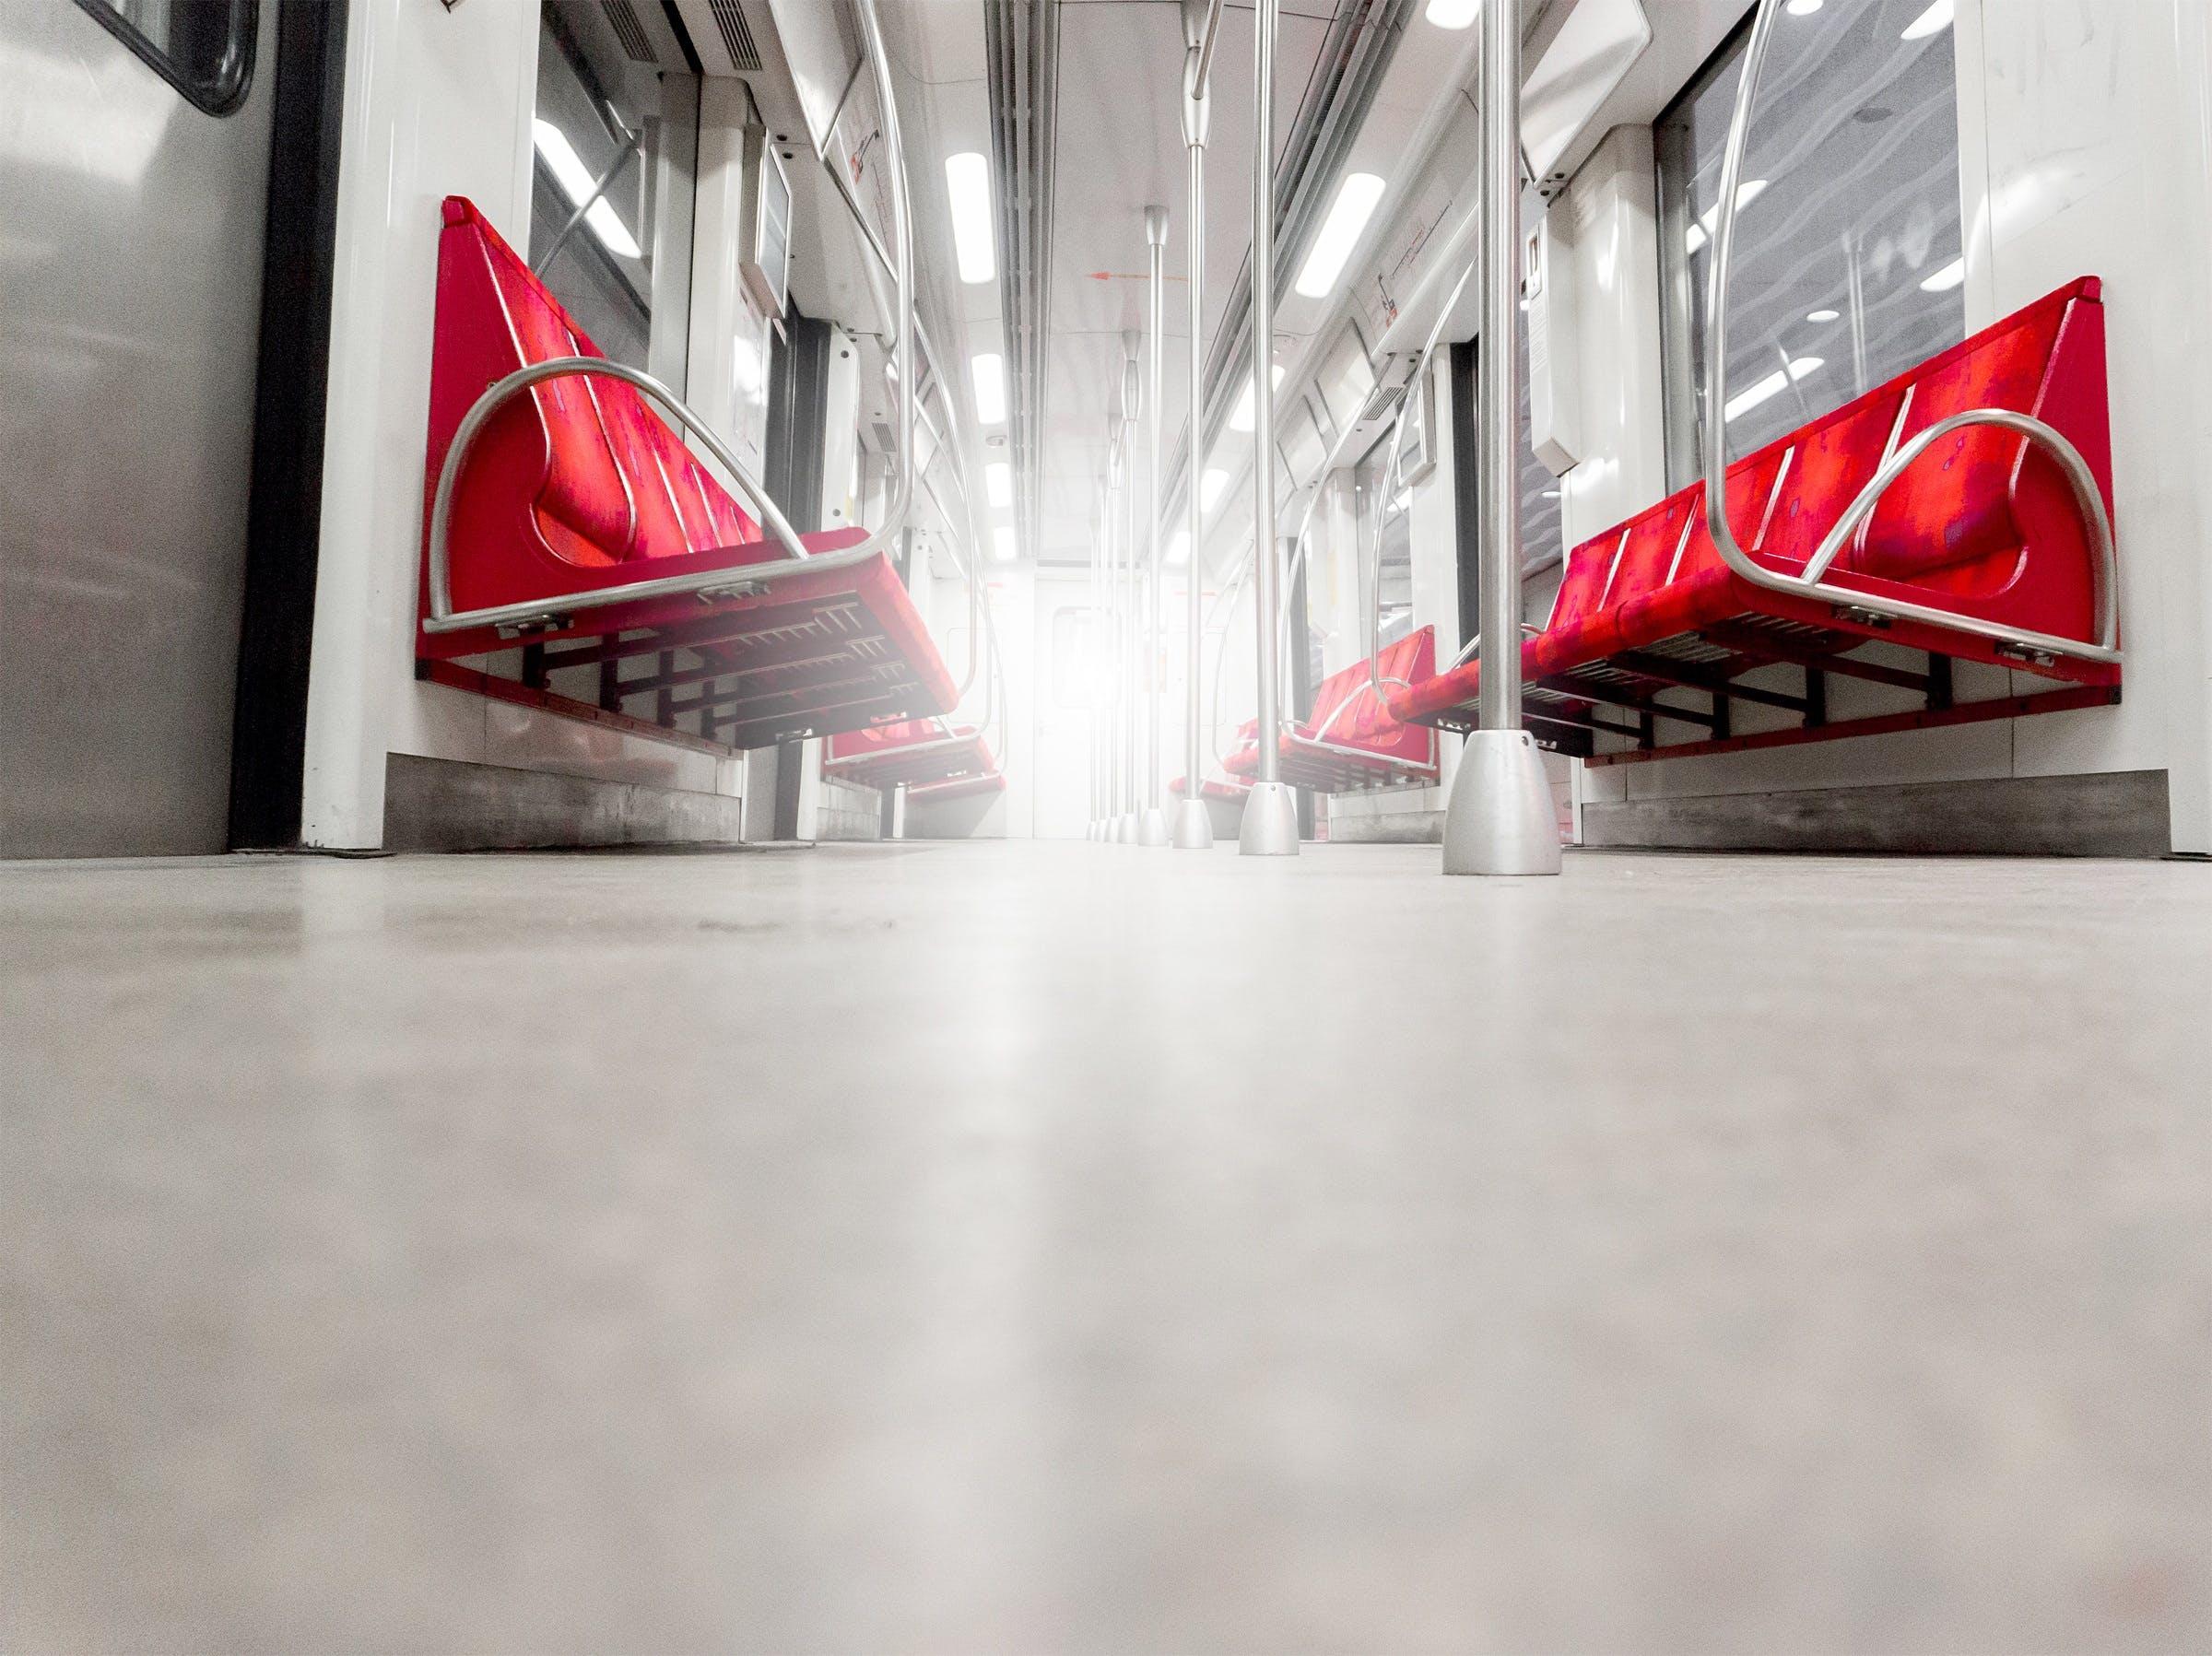 Free stock photo of light, metal, public transportation, rain